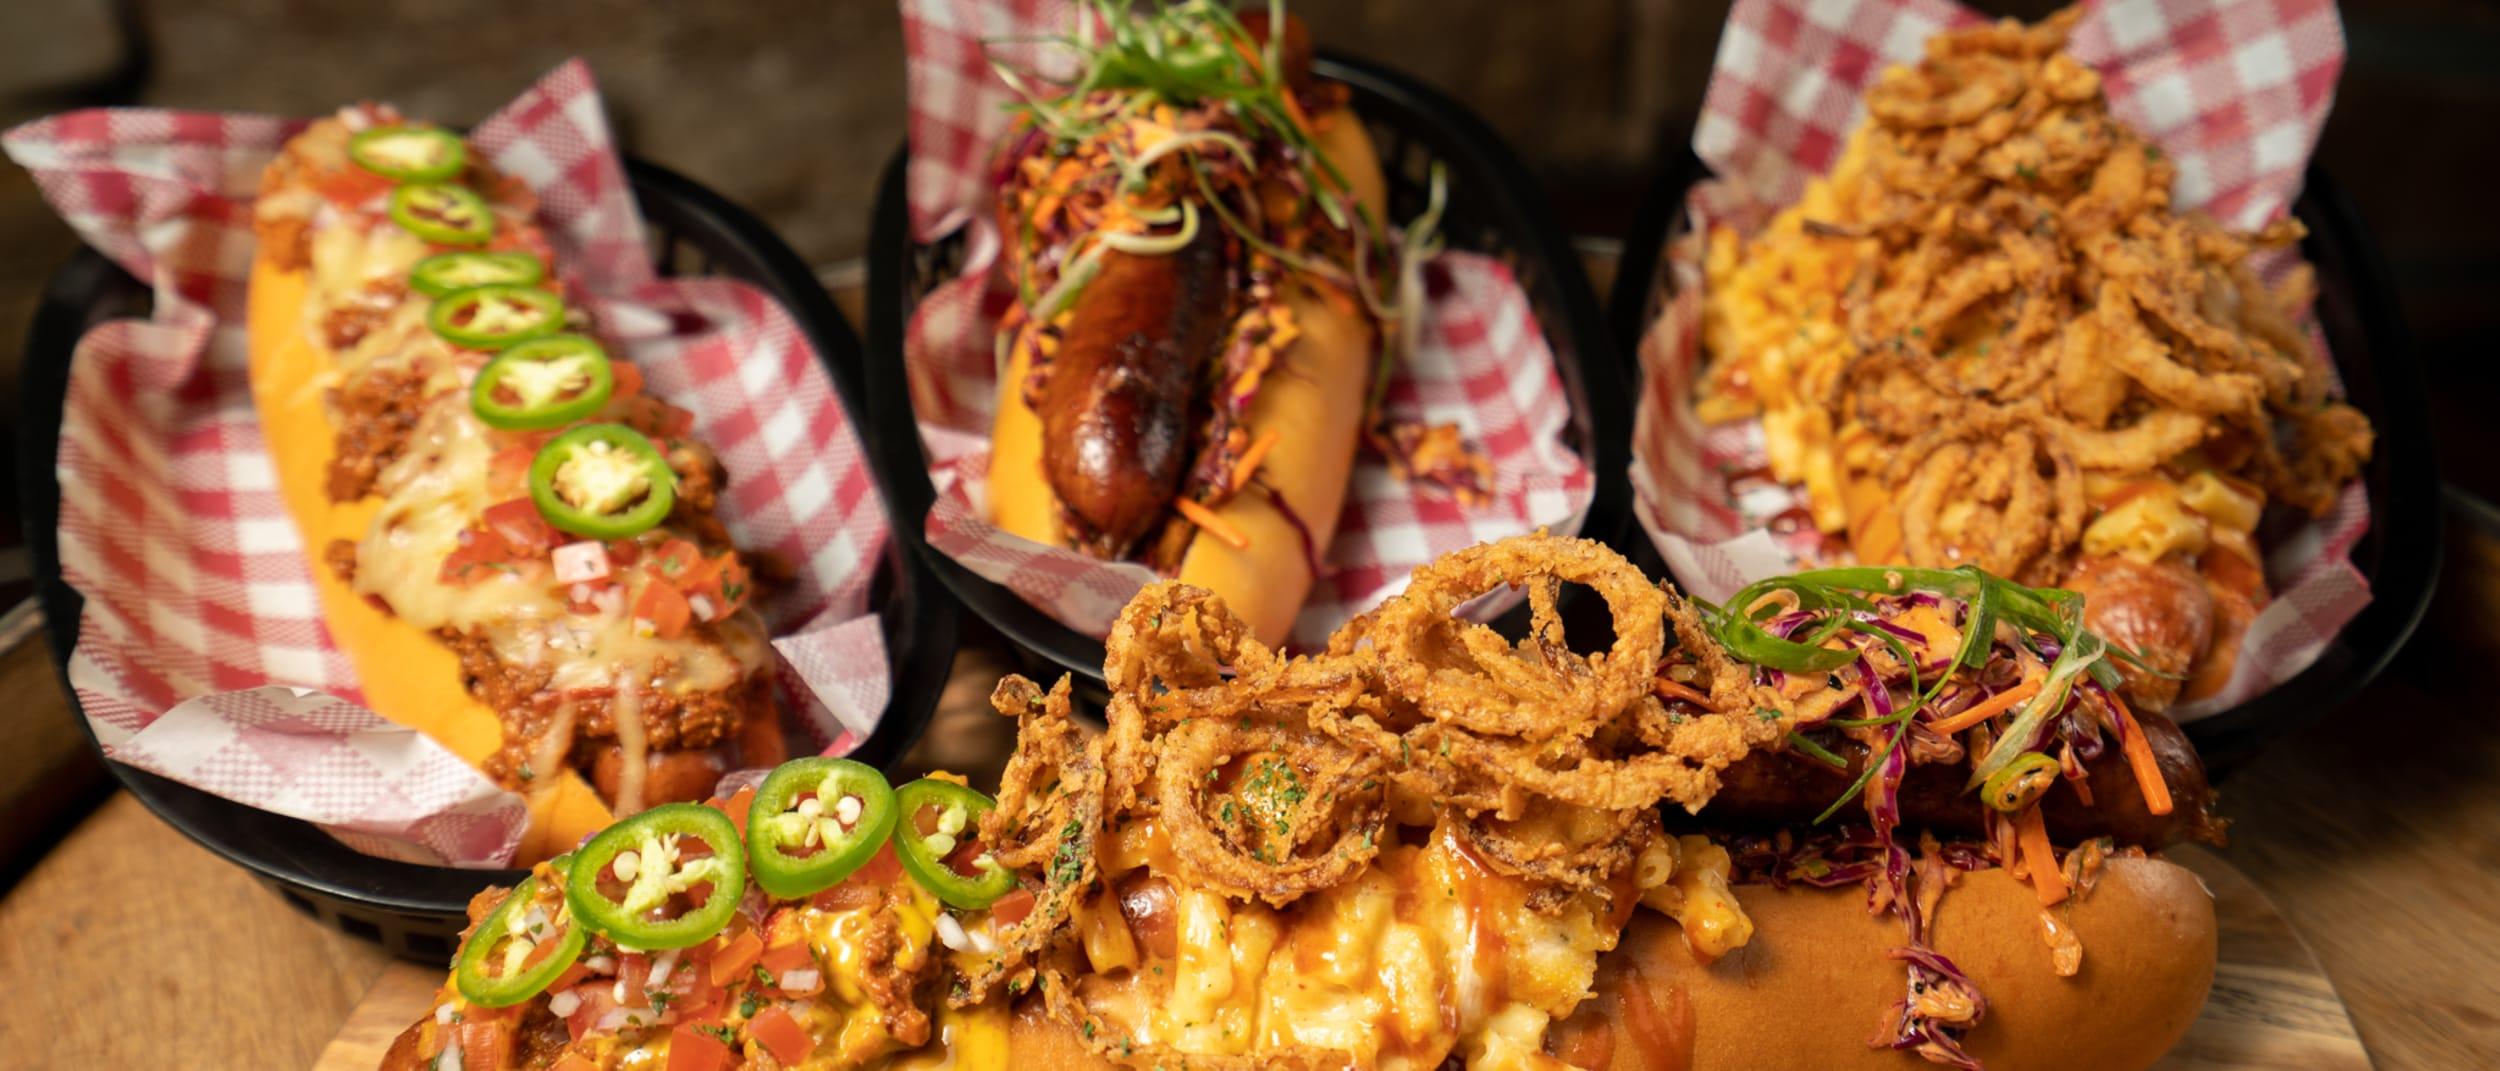 The Bavarian | Mega loaded bratwurst